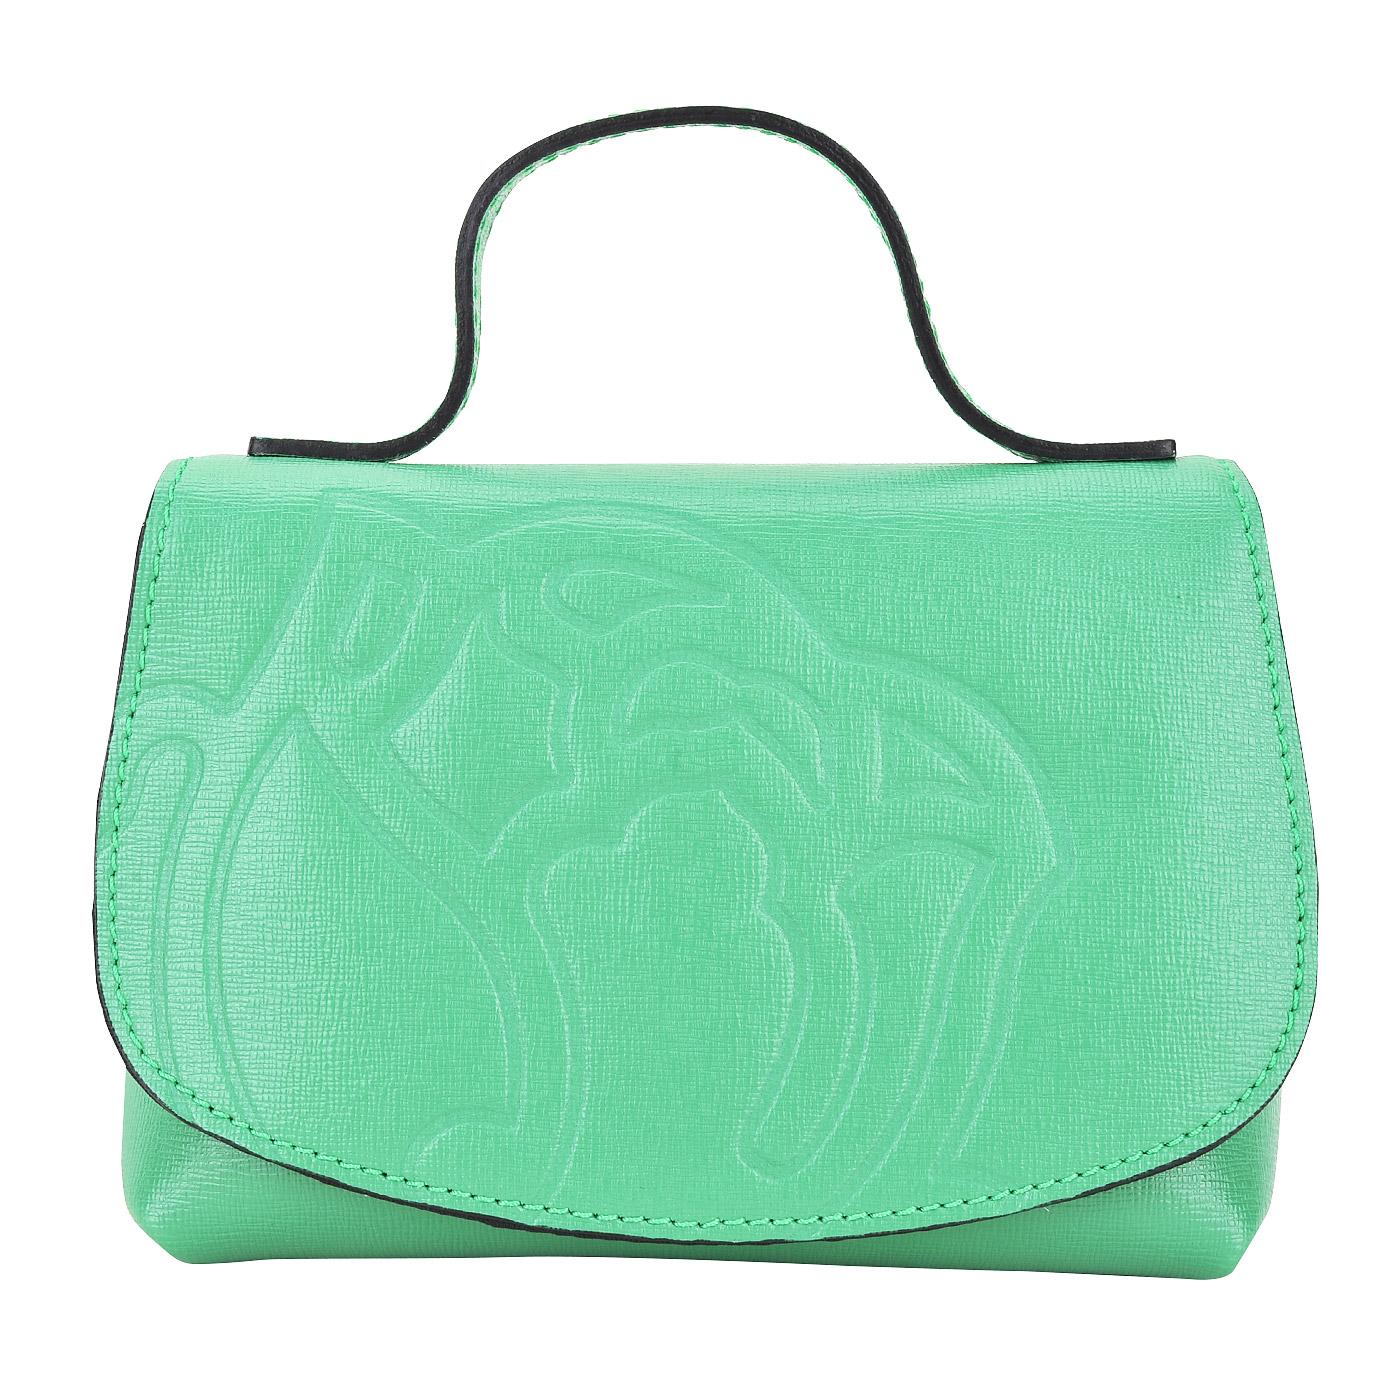 bb1202568691 Женская кожаная сумка Braccialini Ninfea B10691_verde ...